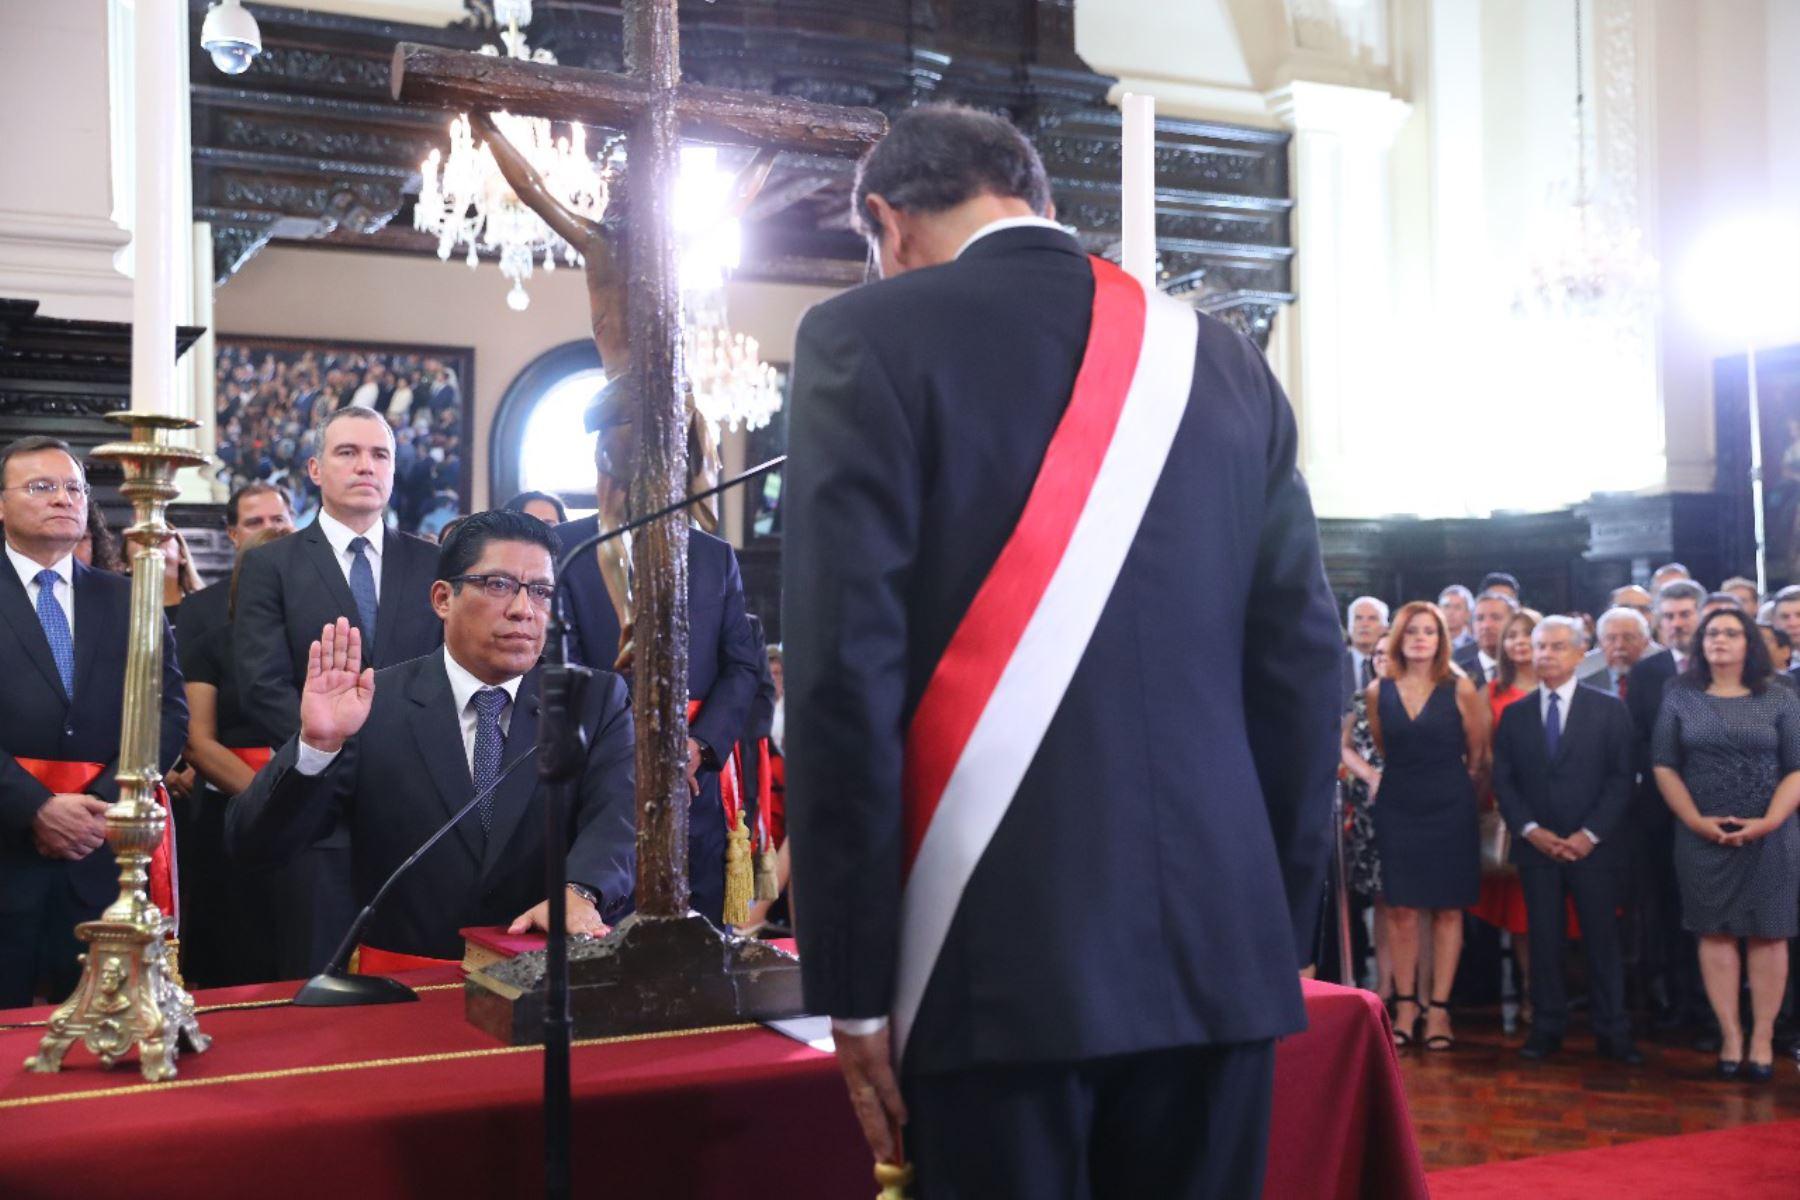 Vicente Zeballos juramenta como ministro de Justicia. Foto: ANDINA/Prensa Presidencia